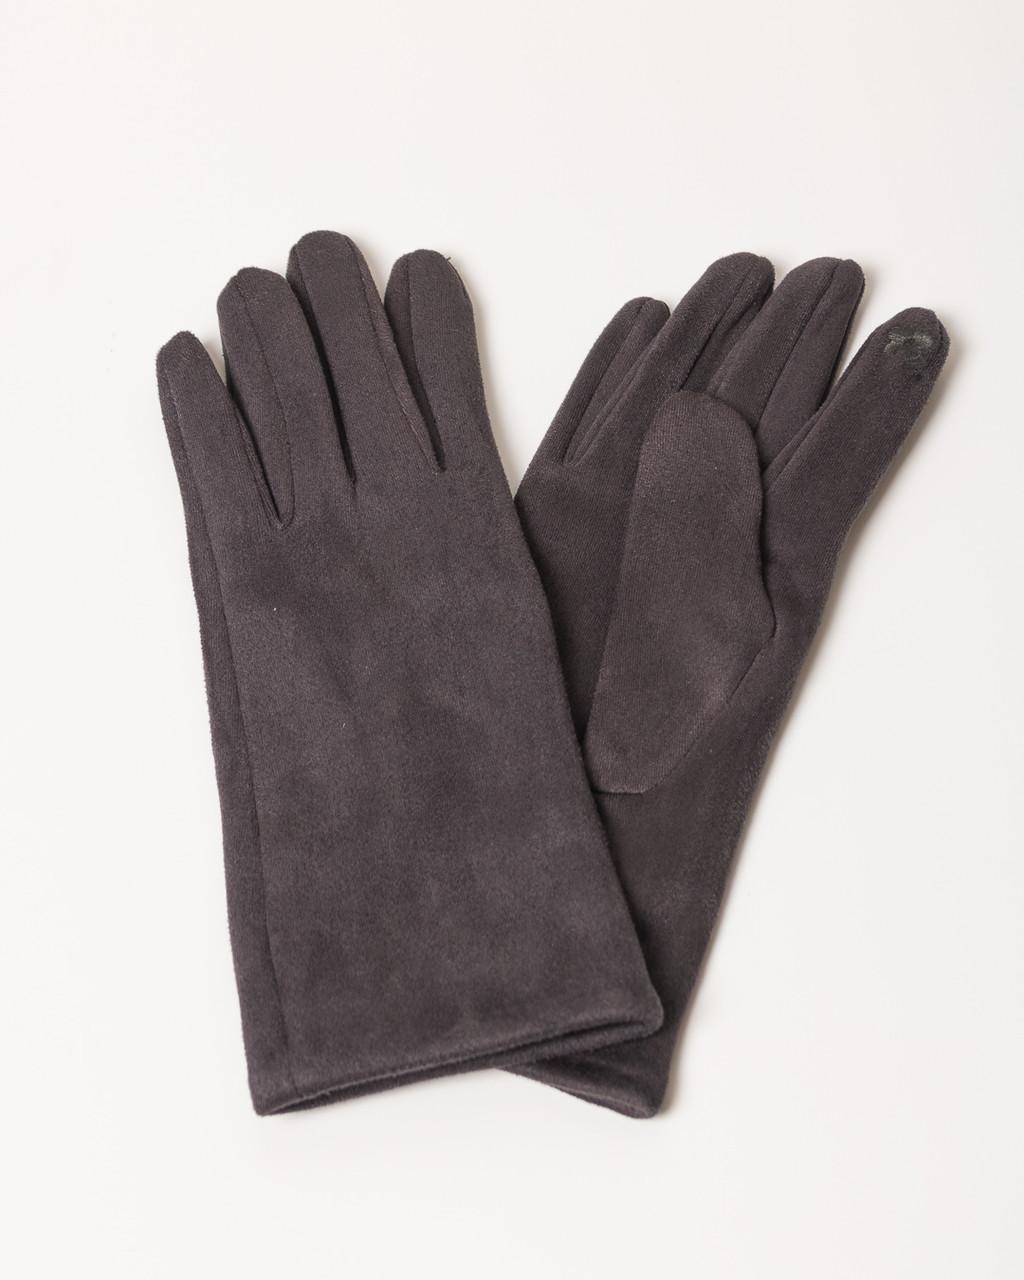 Перчатки женские MM SWEET G1467 DARK GREY TOUCH SCREEN